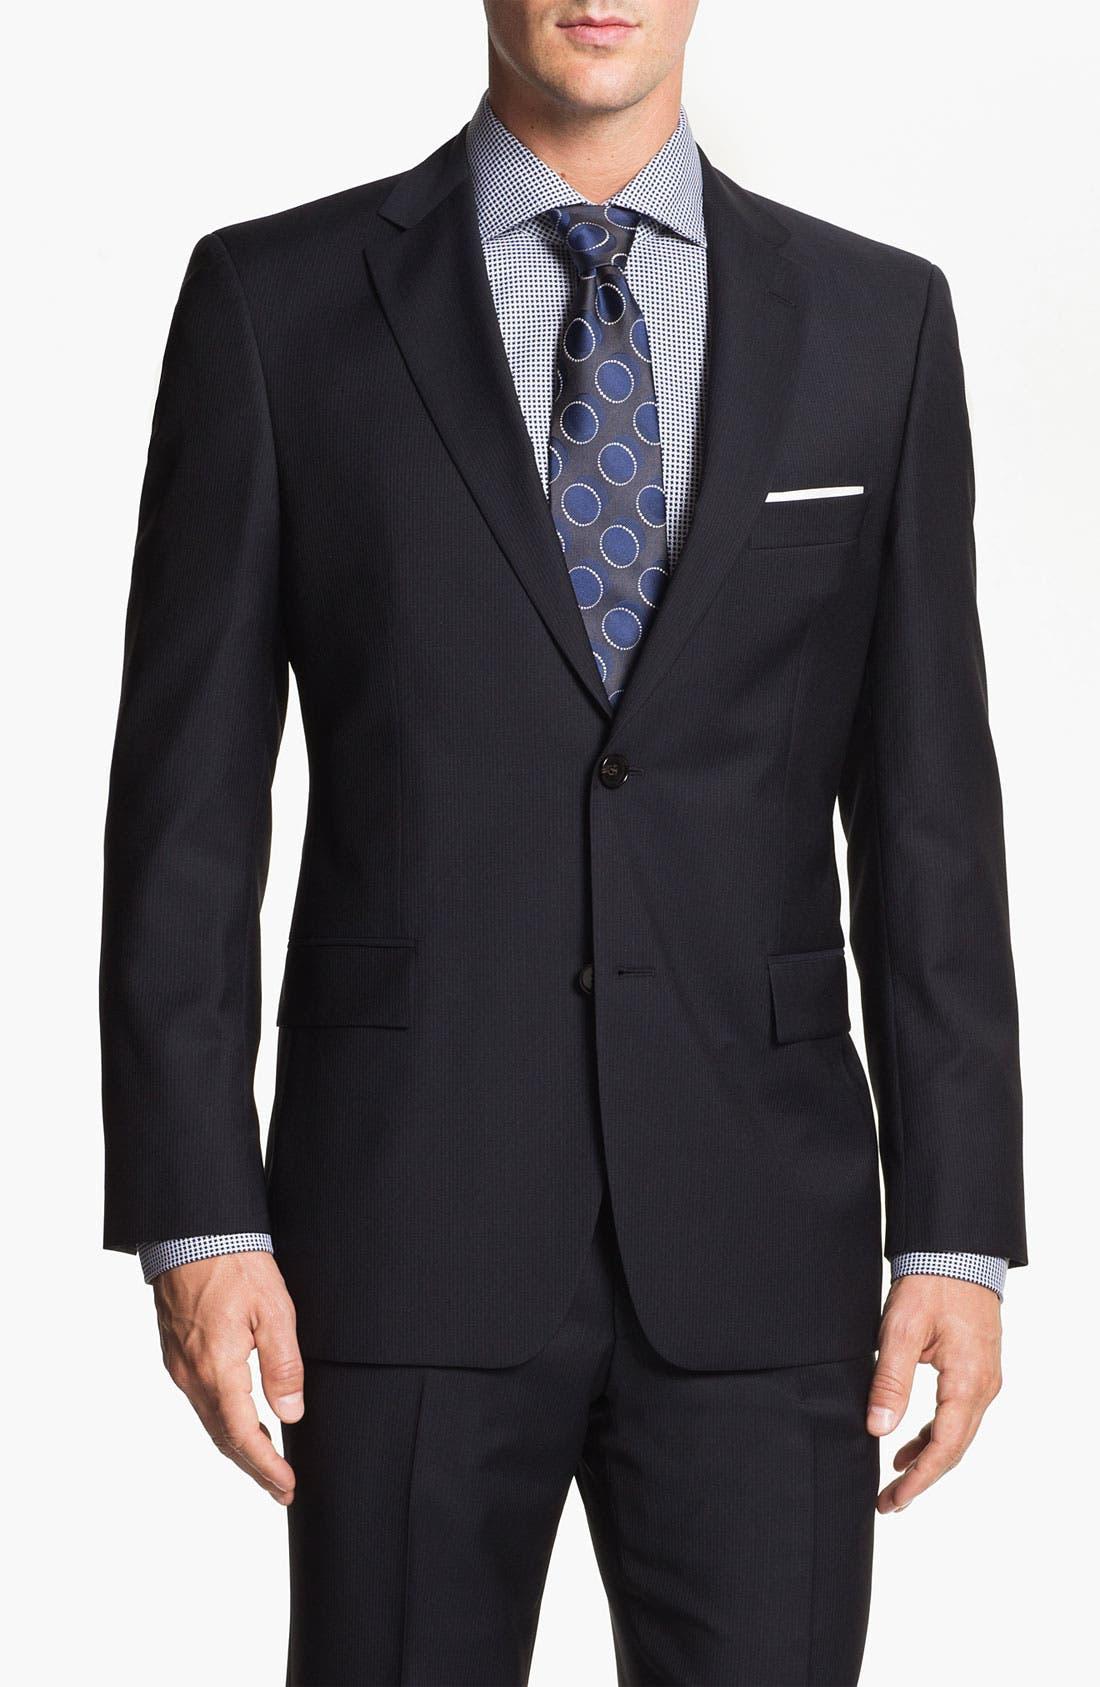 Main Image - BOSS Black 'Pasolini/Movie' Stripe Suit